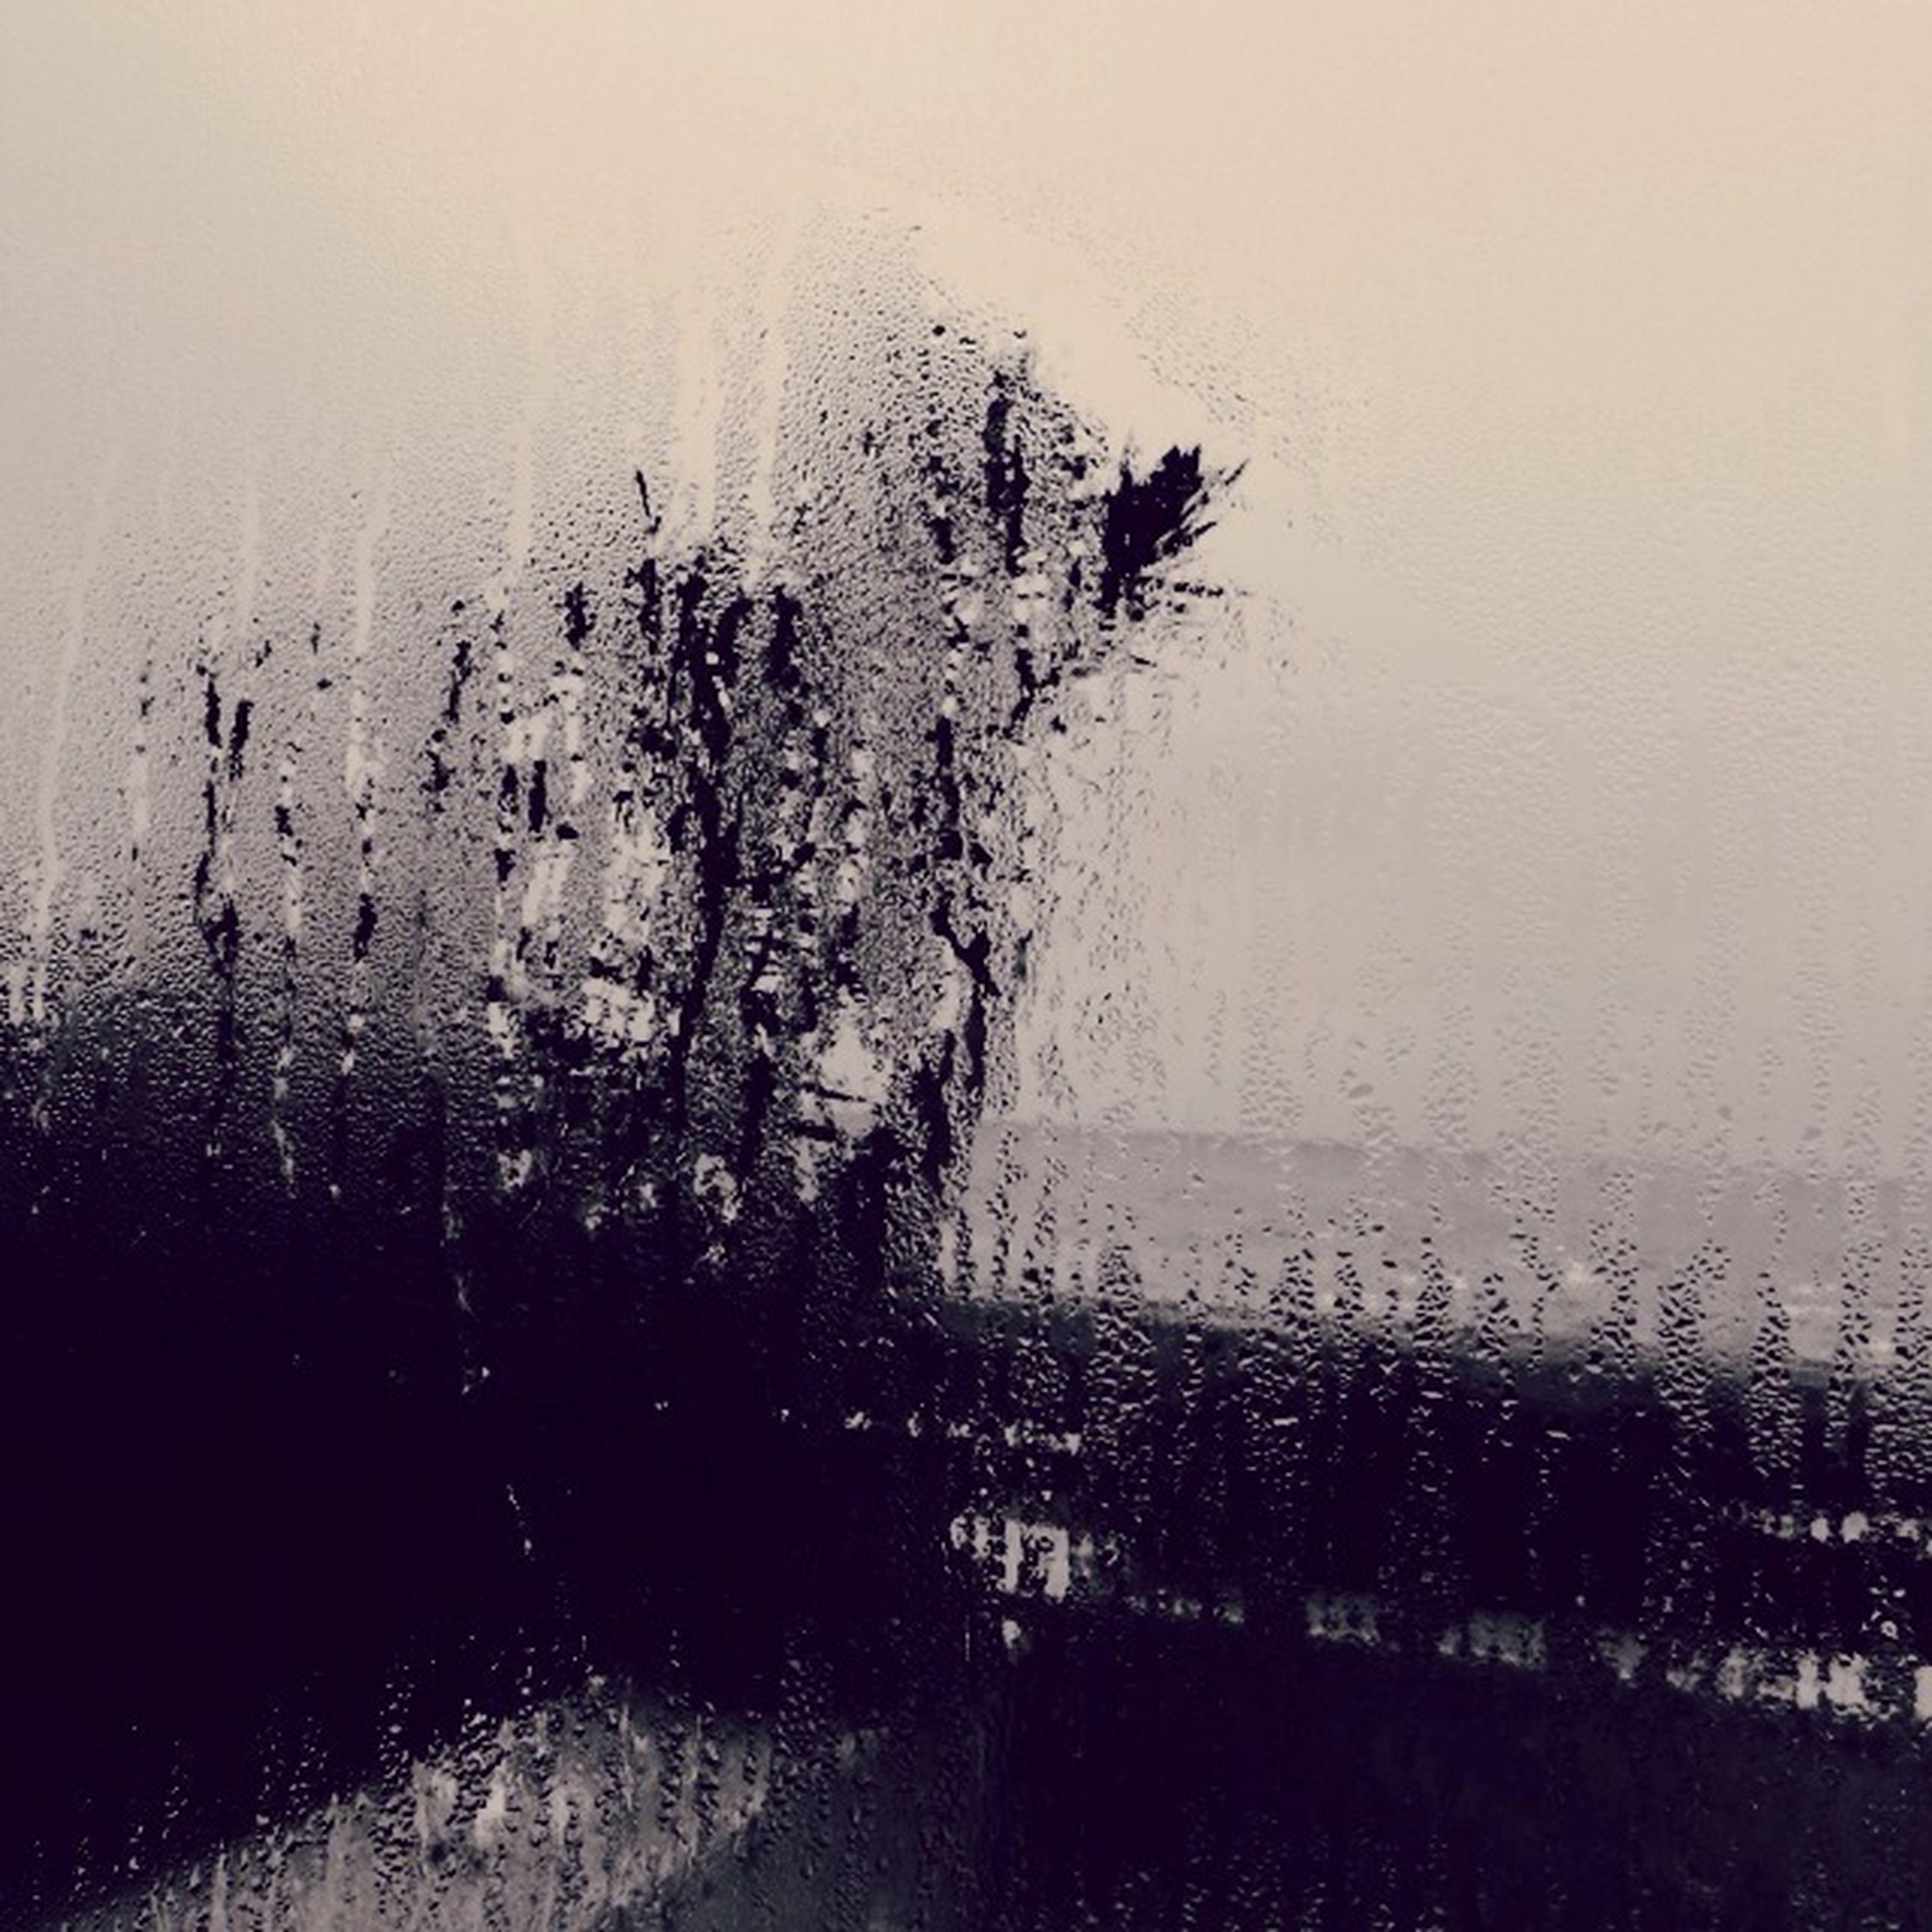 drop, wet, rain, water, window, transparent, glass - material, raindrop, indoors, weather, season, monsoon, glass, focus on foreground, rainy season, sky, close-up, droplet, nature, day